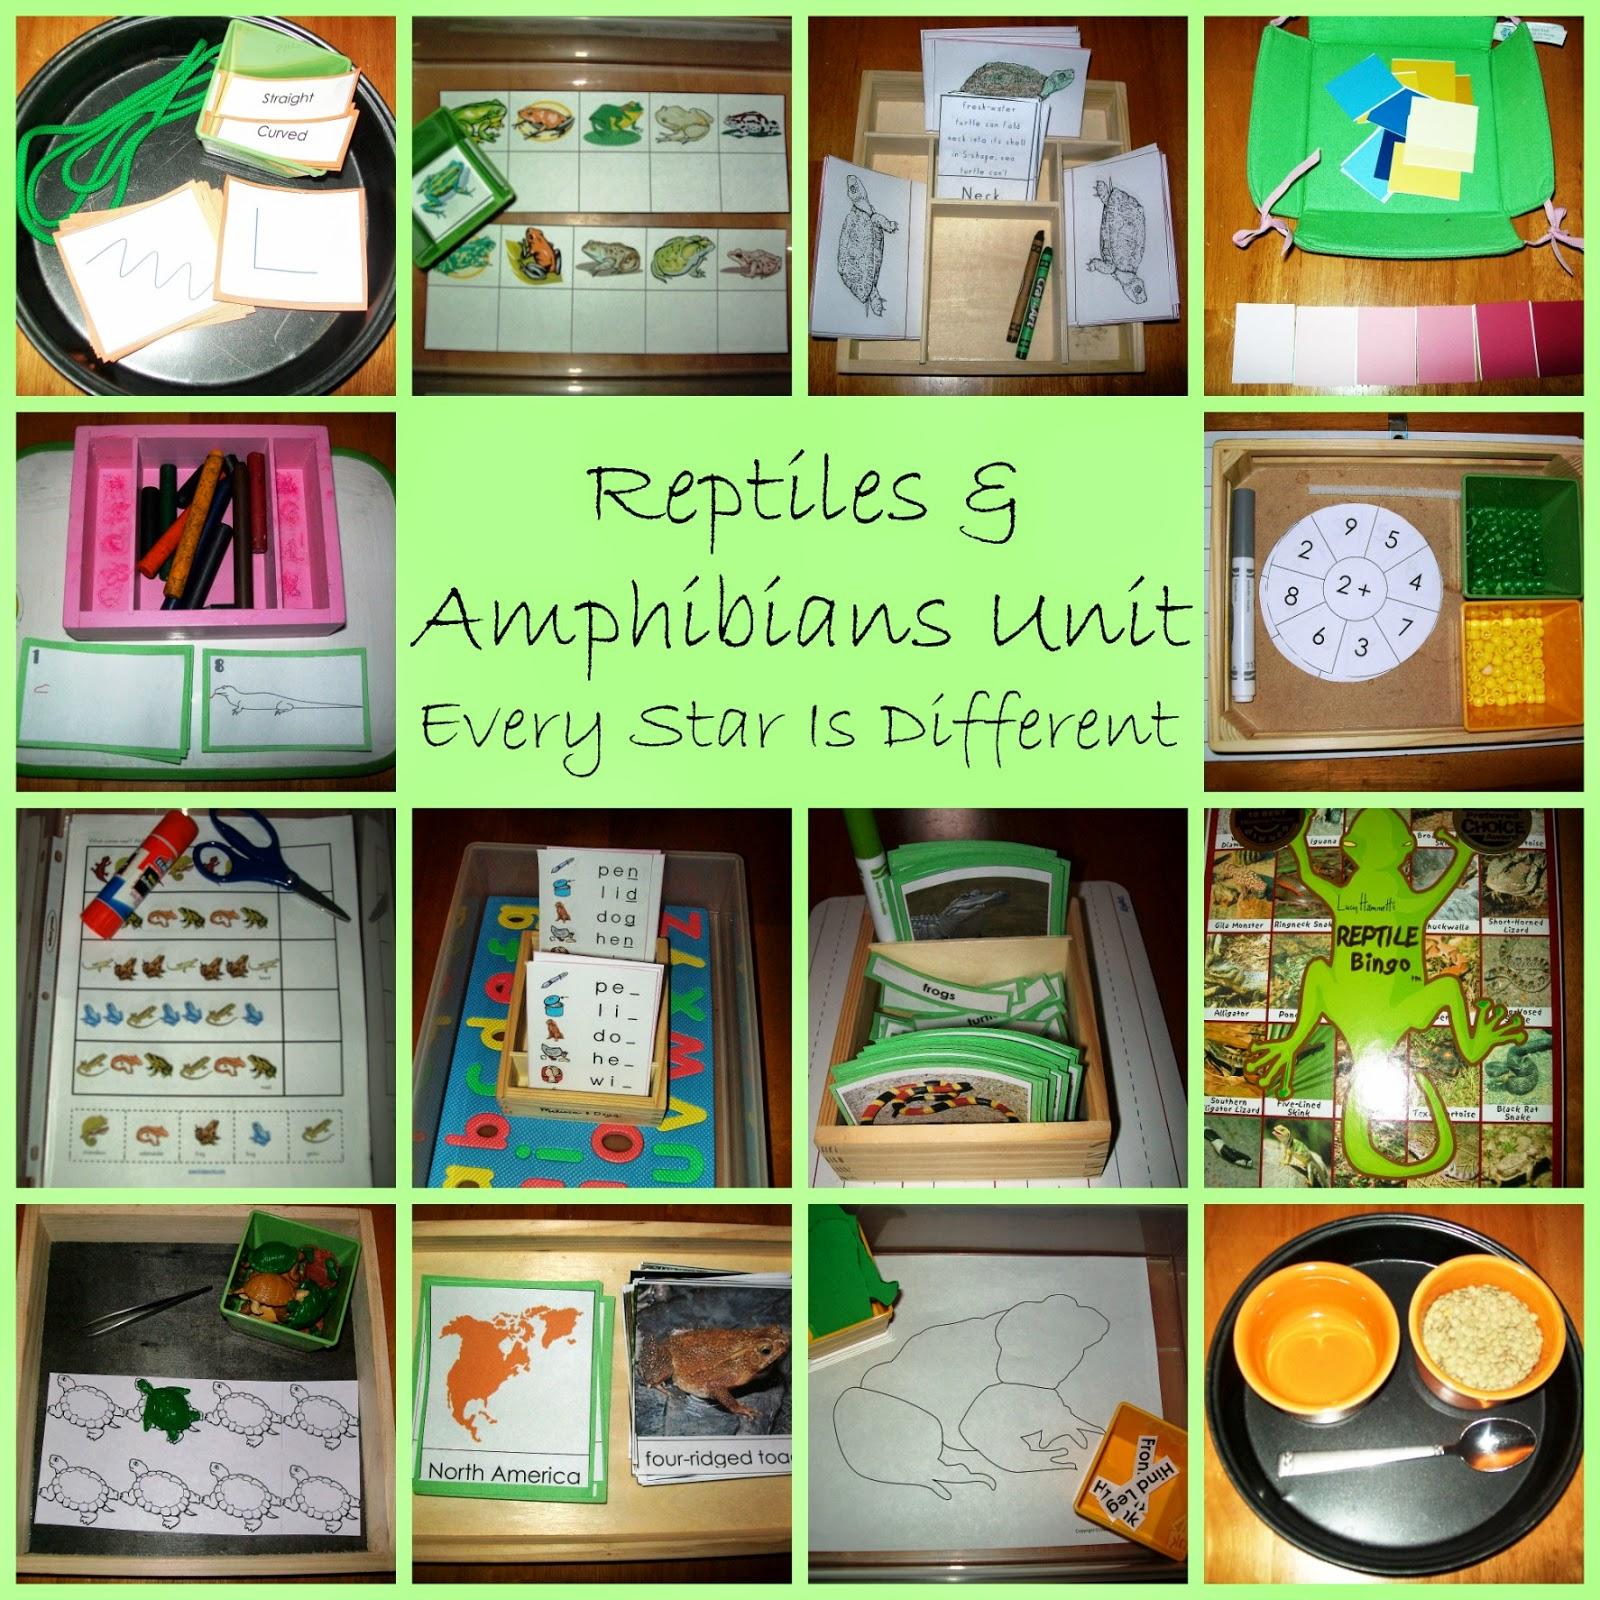 Reptiles and Amphibians Unit